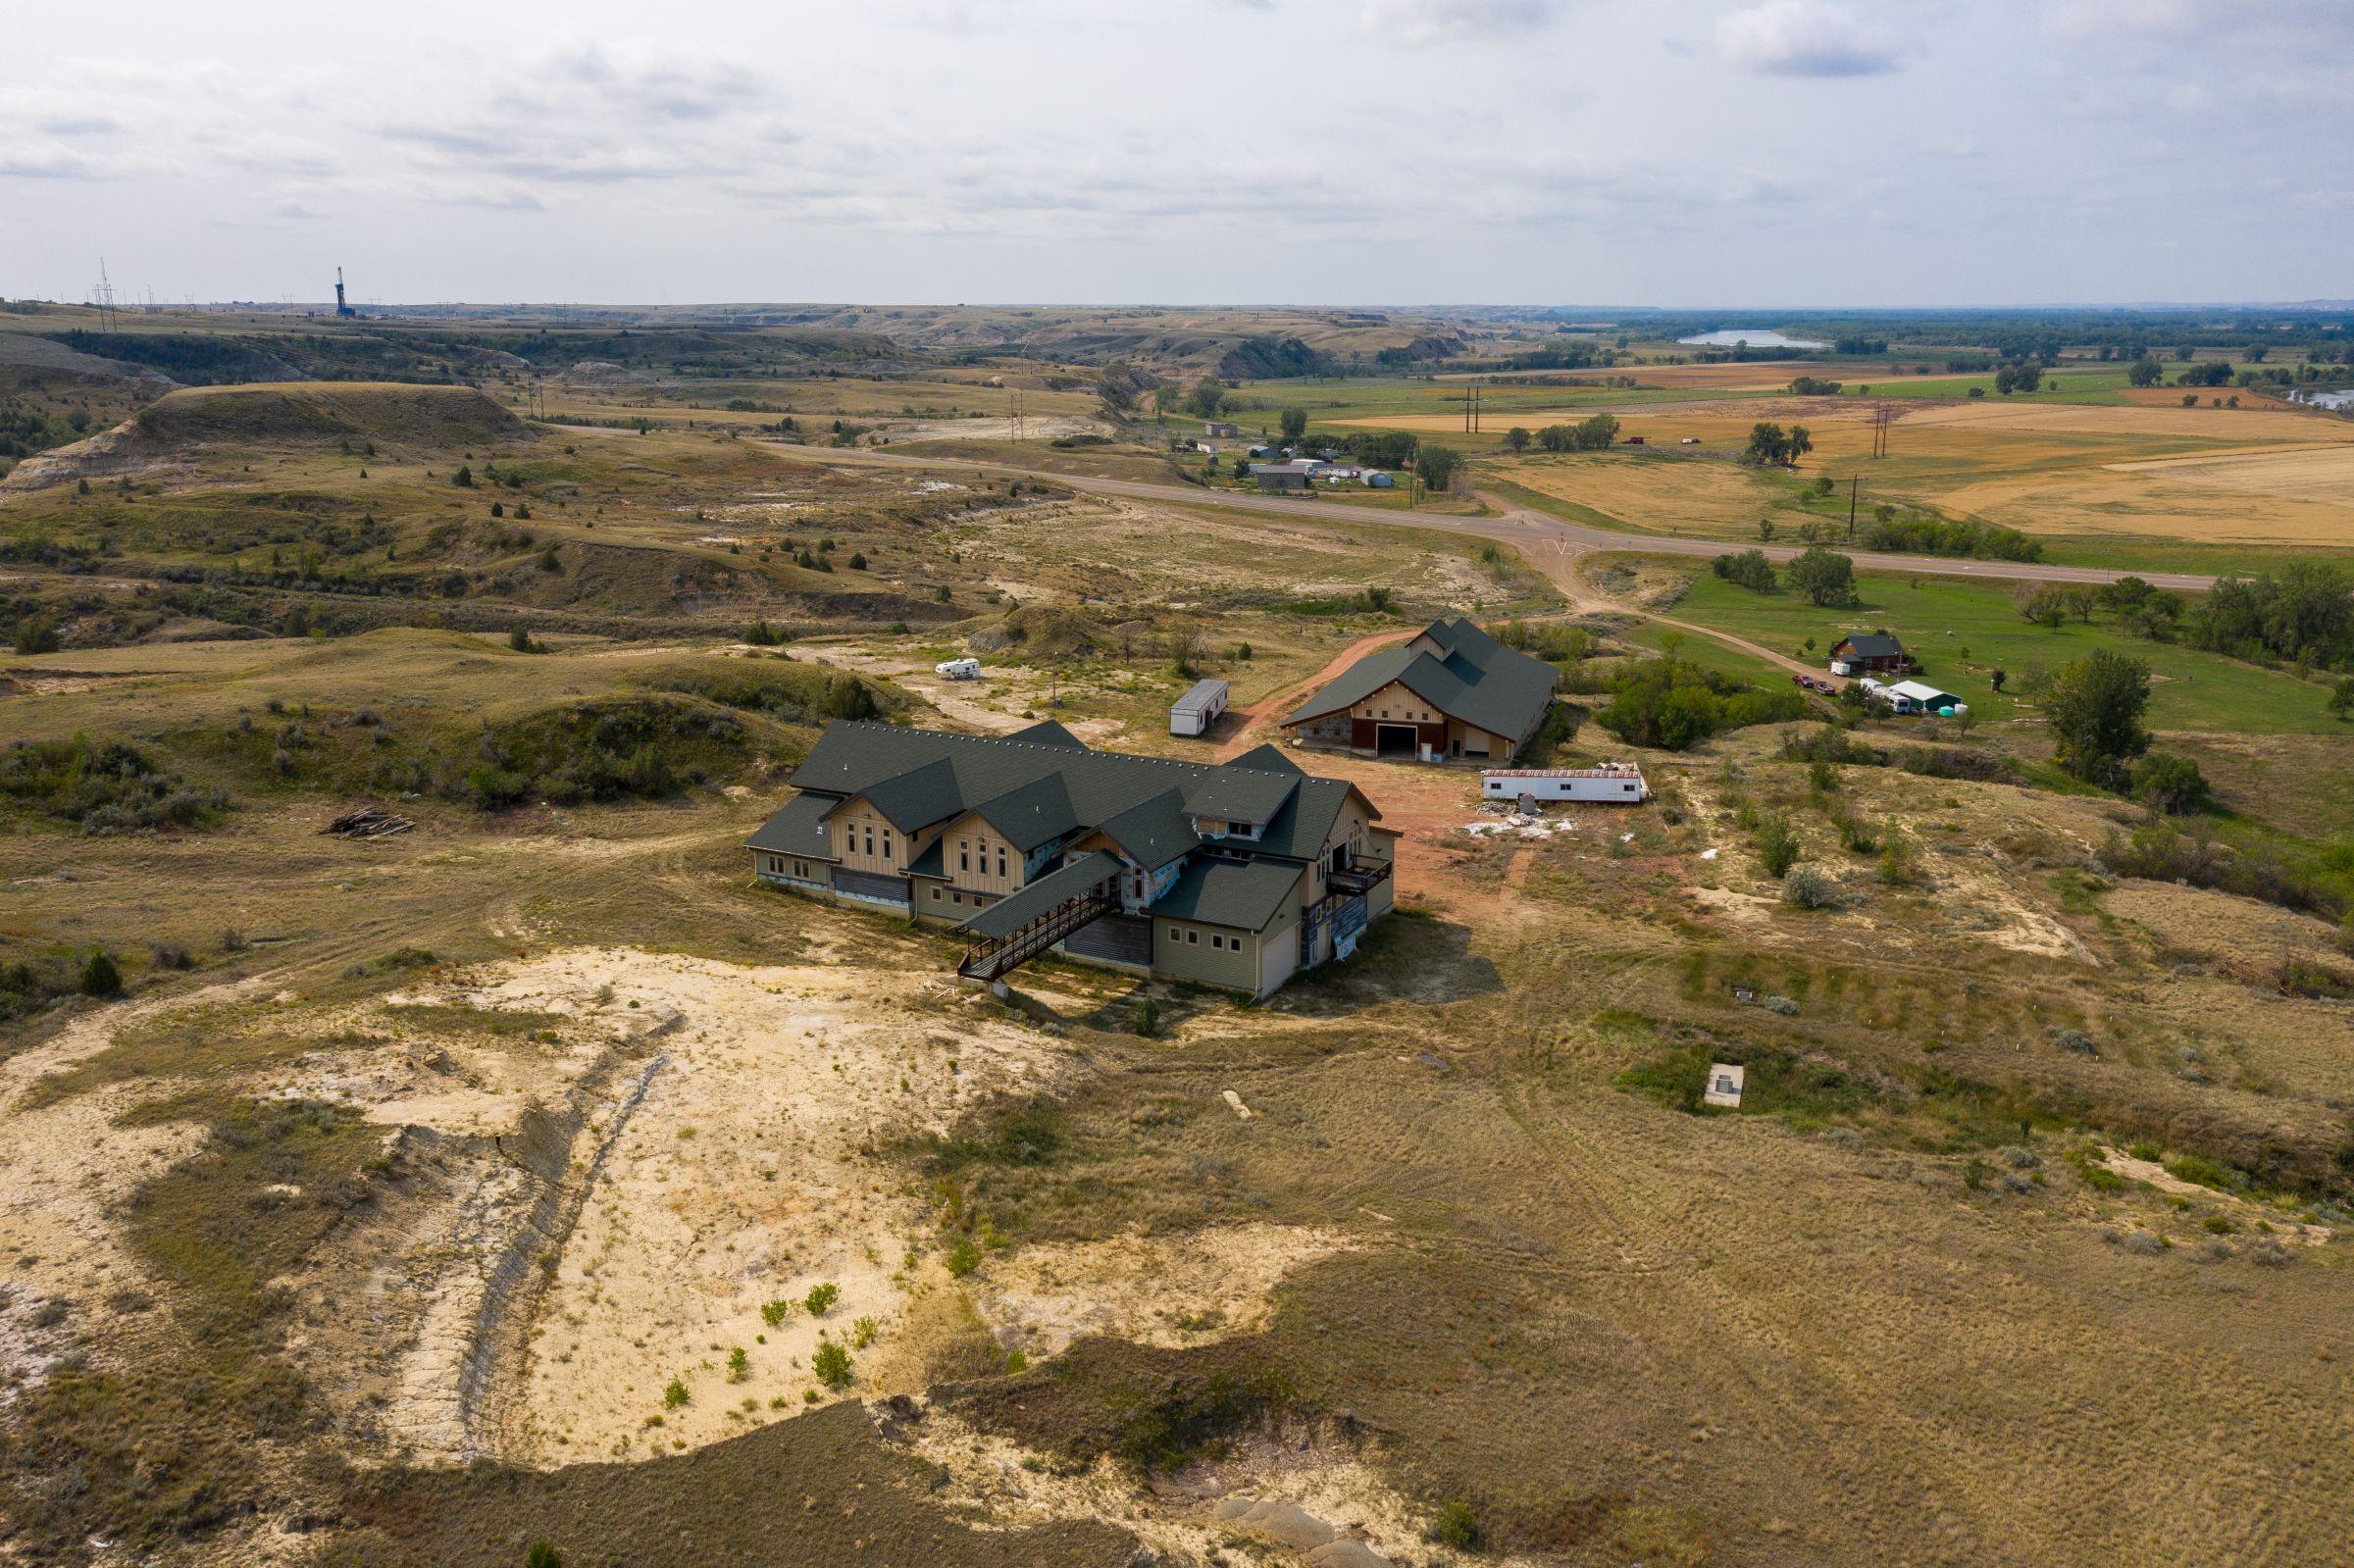 auctions-land-mckenzie-county-north-dakota-270-acres-listing-number-15735-2-2021-09-10-124714.jpeg